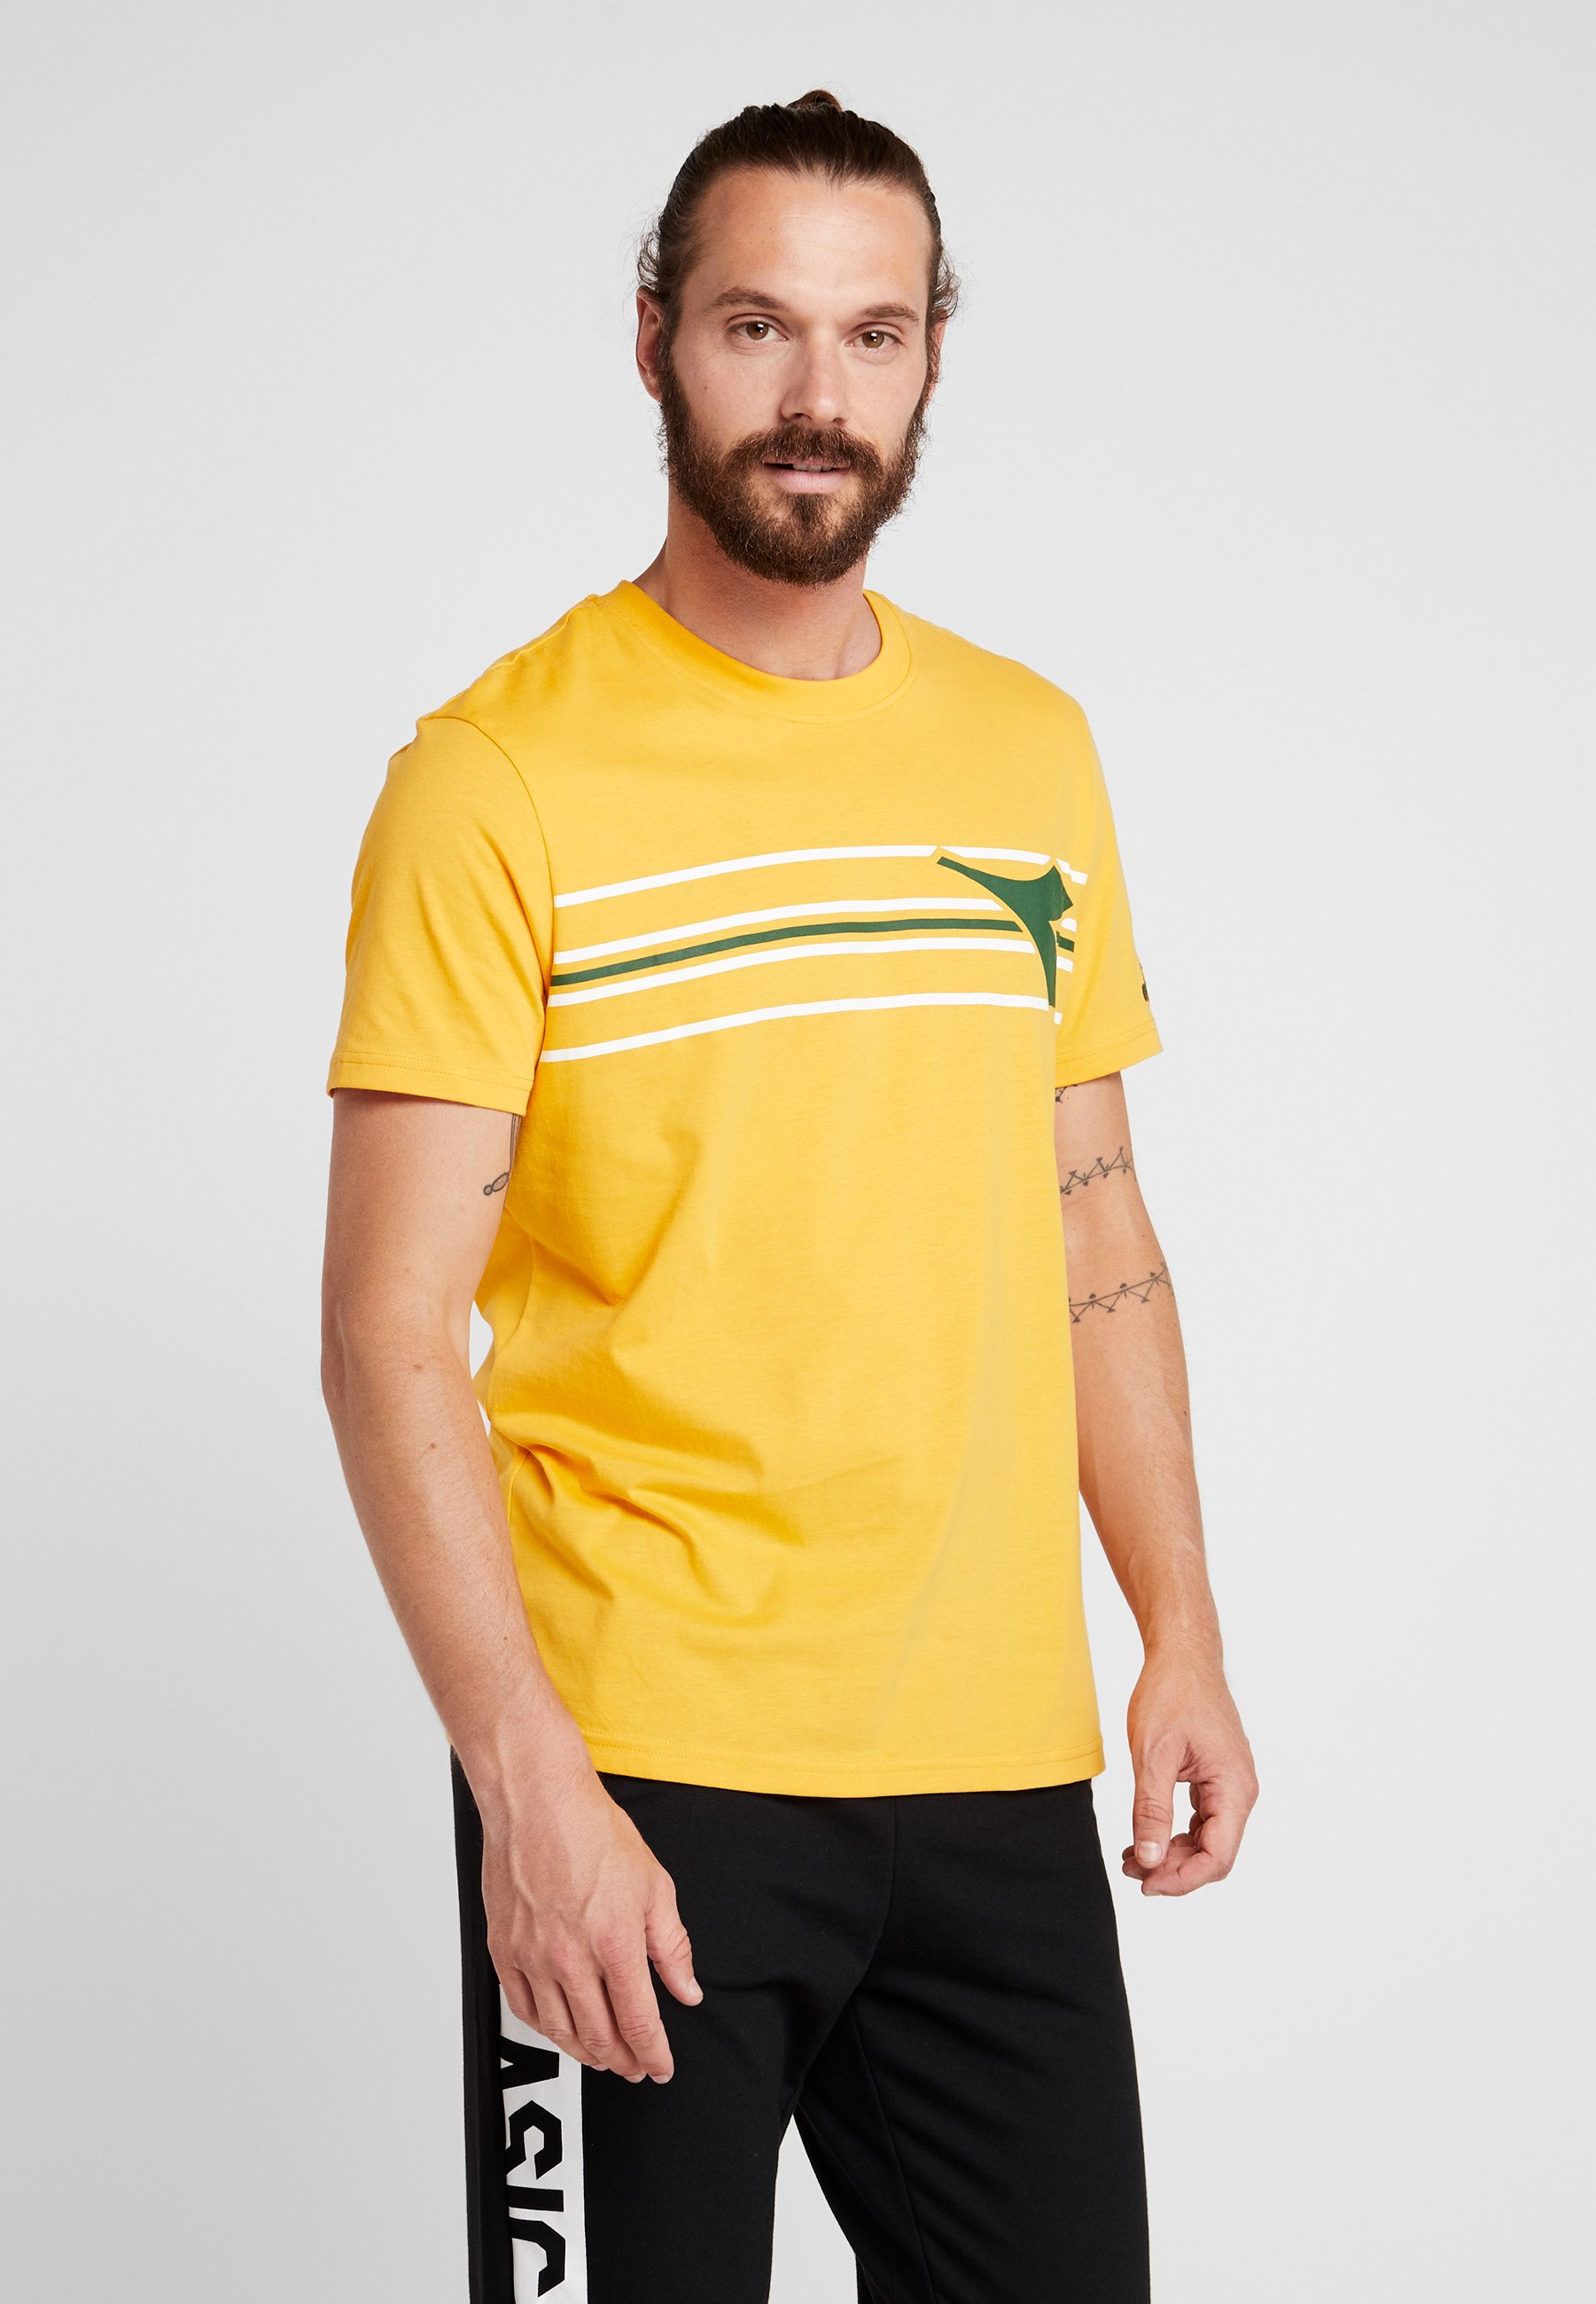 Imprimé Orange Diadora FregioT shirt Mustard m8wONn0v